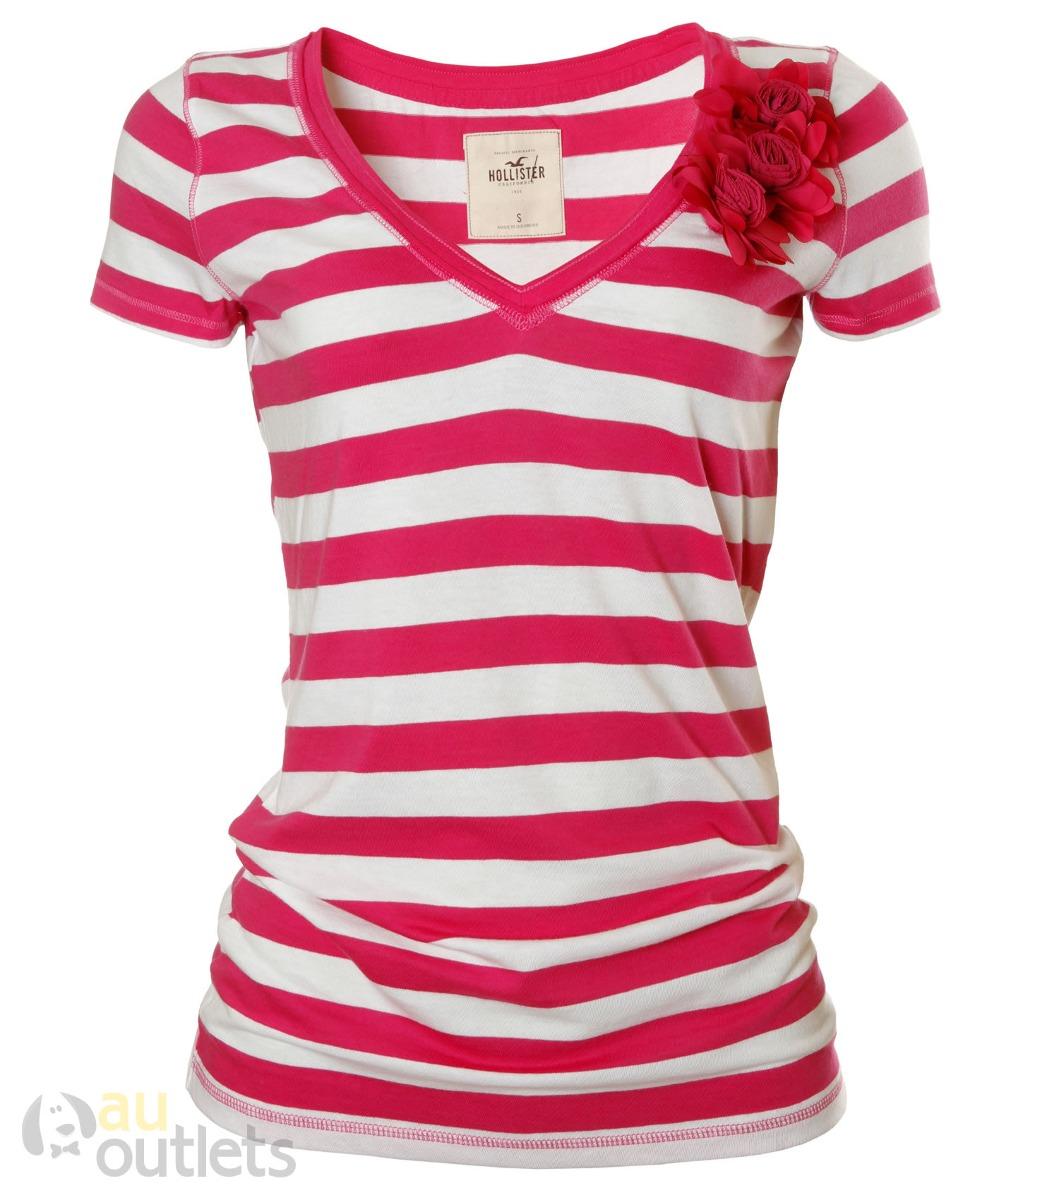 f4ee65ad38 camiseta feminina hollister rosalia. Carregando zoom.